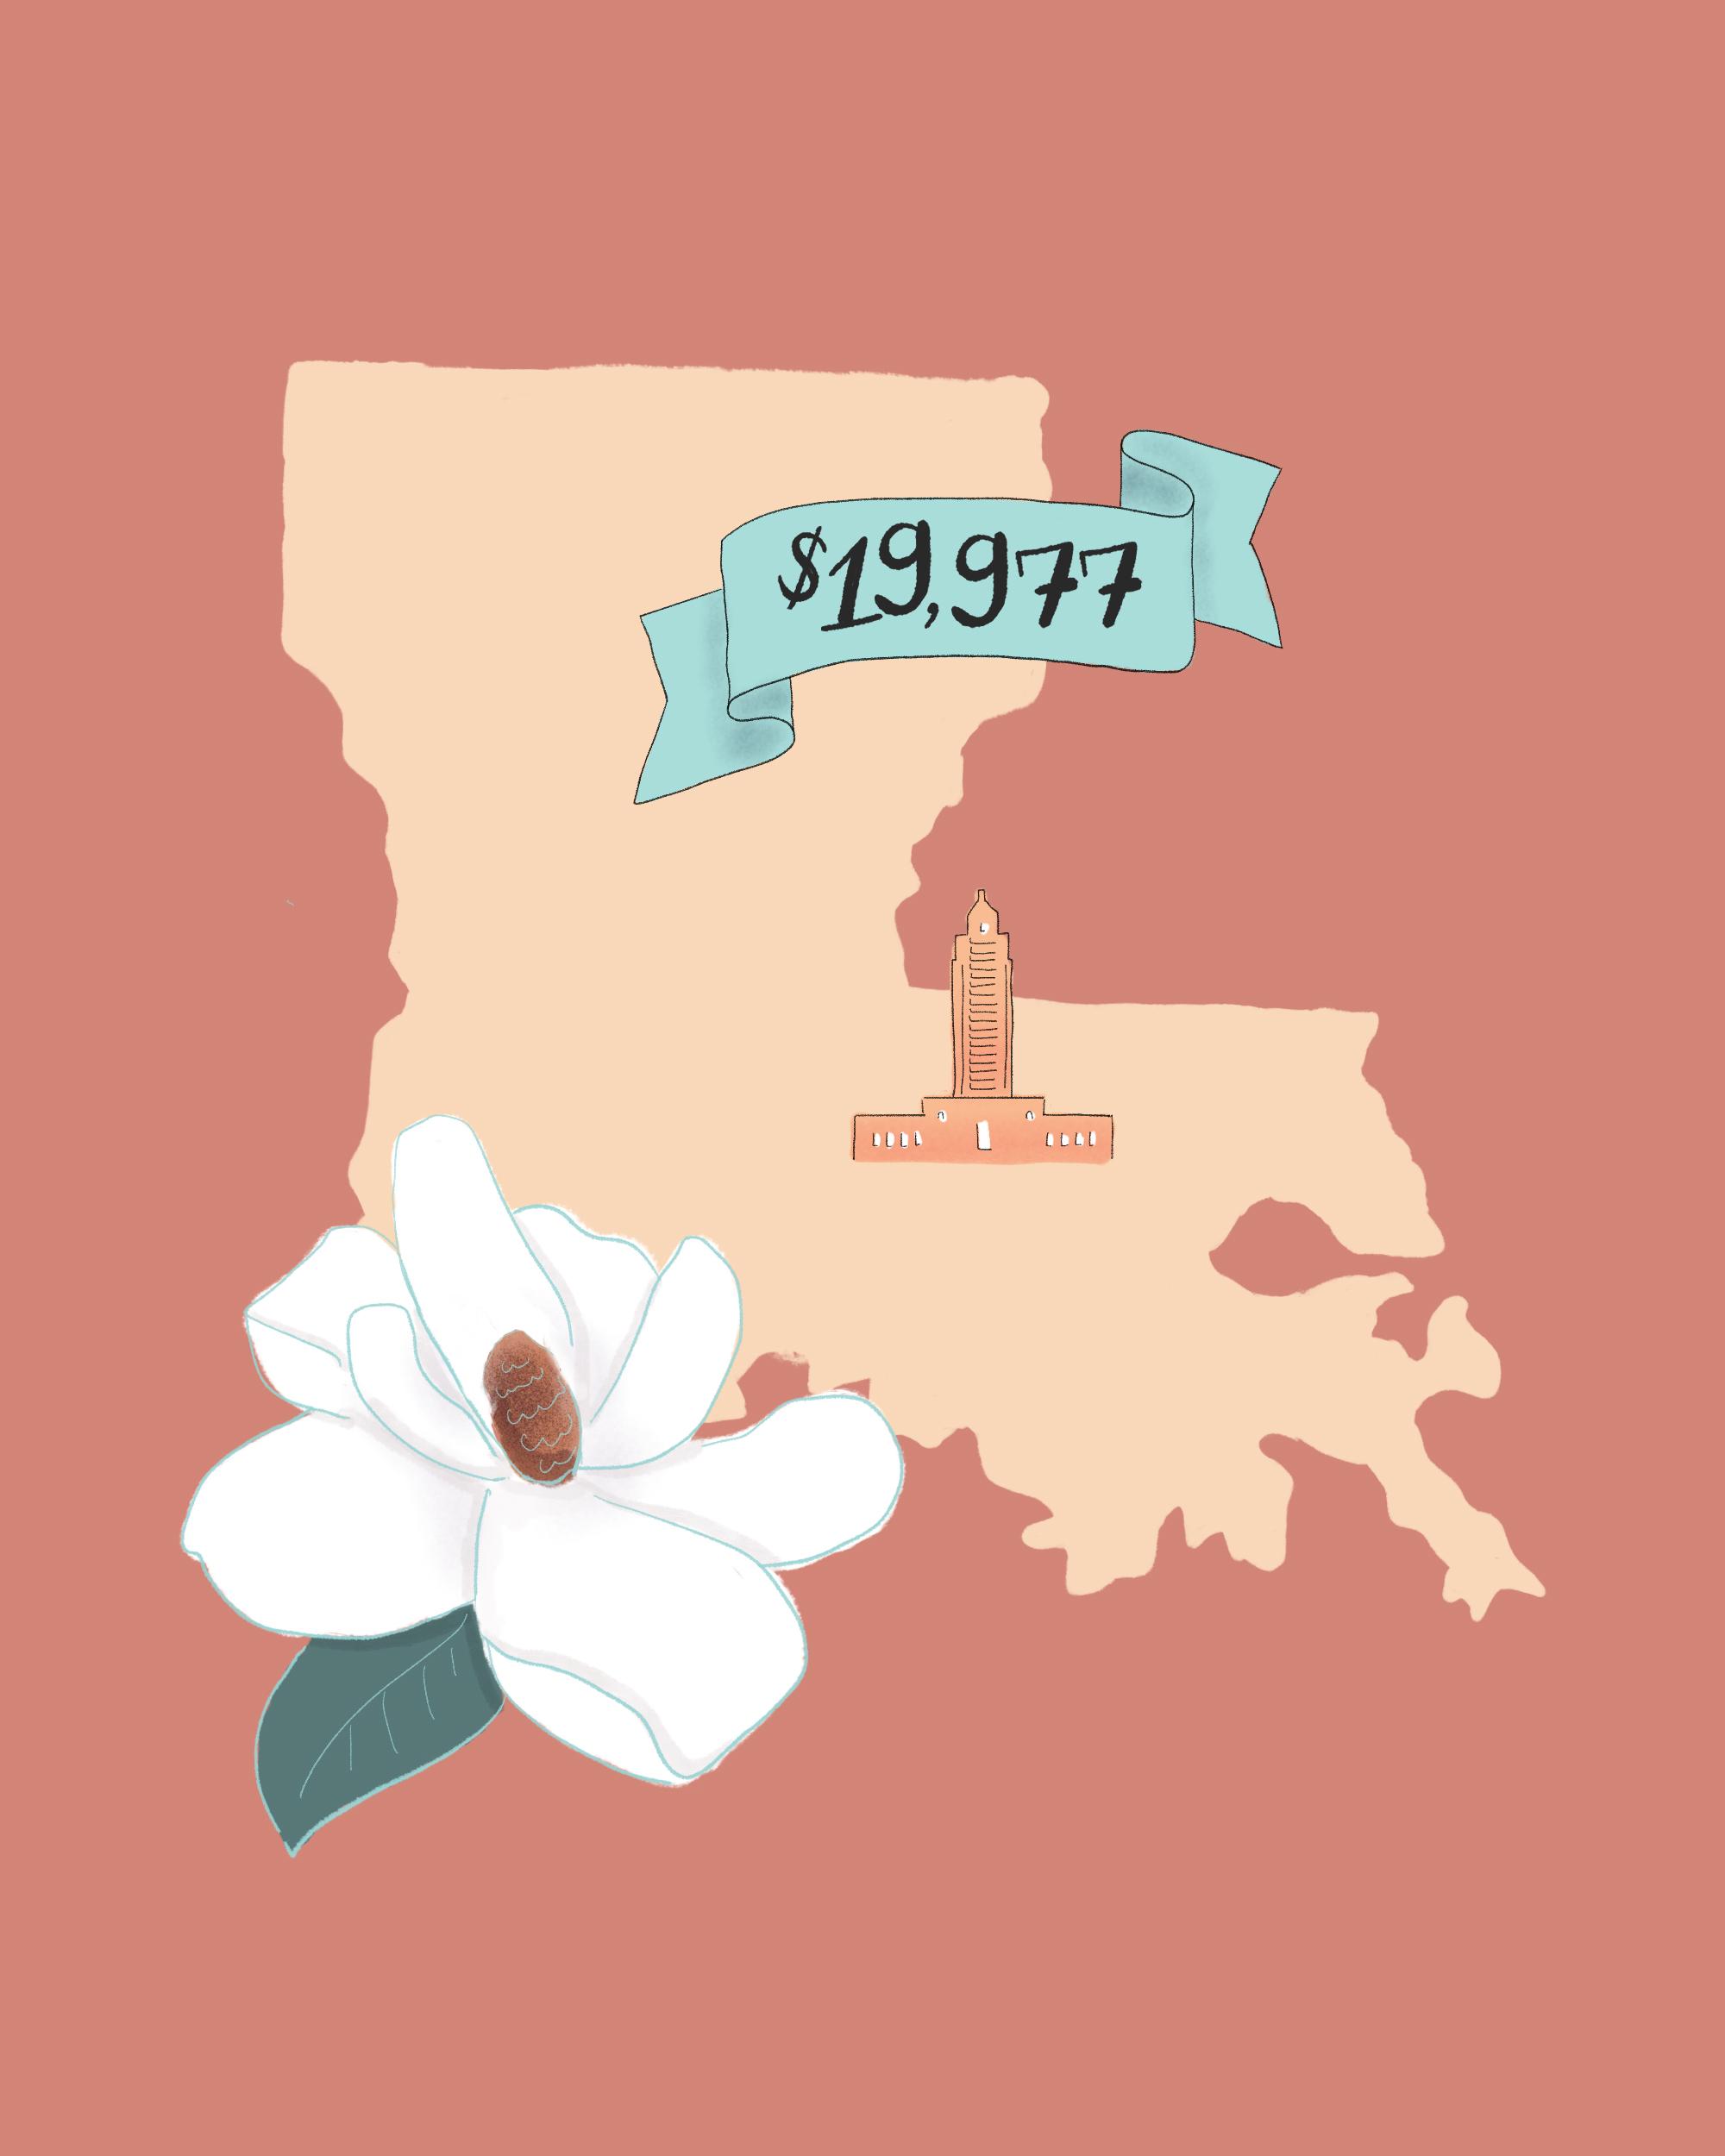 state wedding costs illustration louisiana